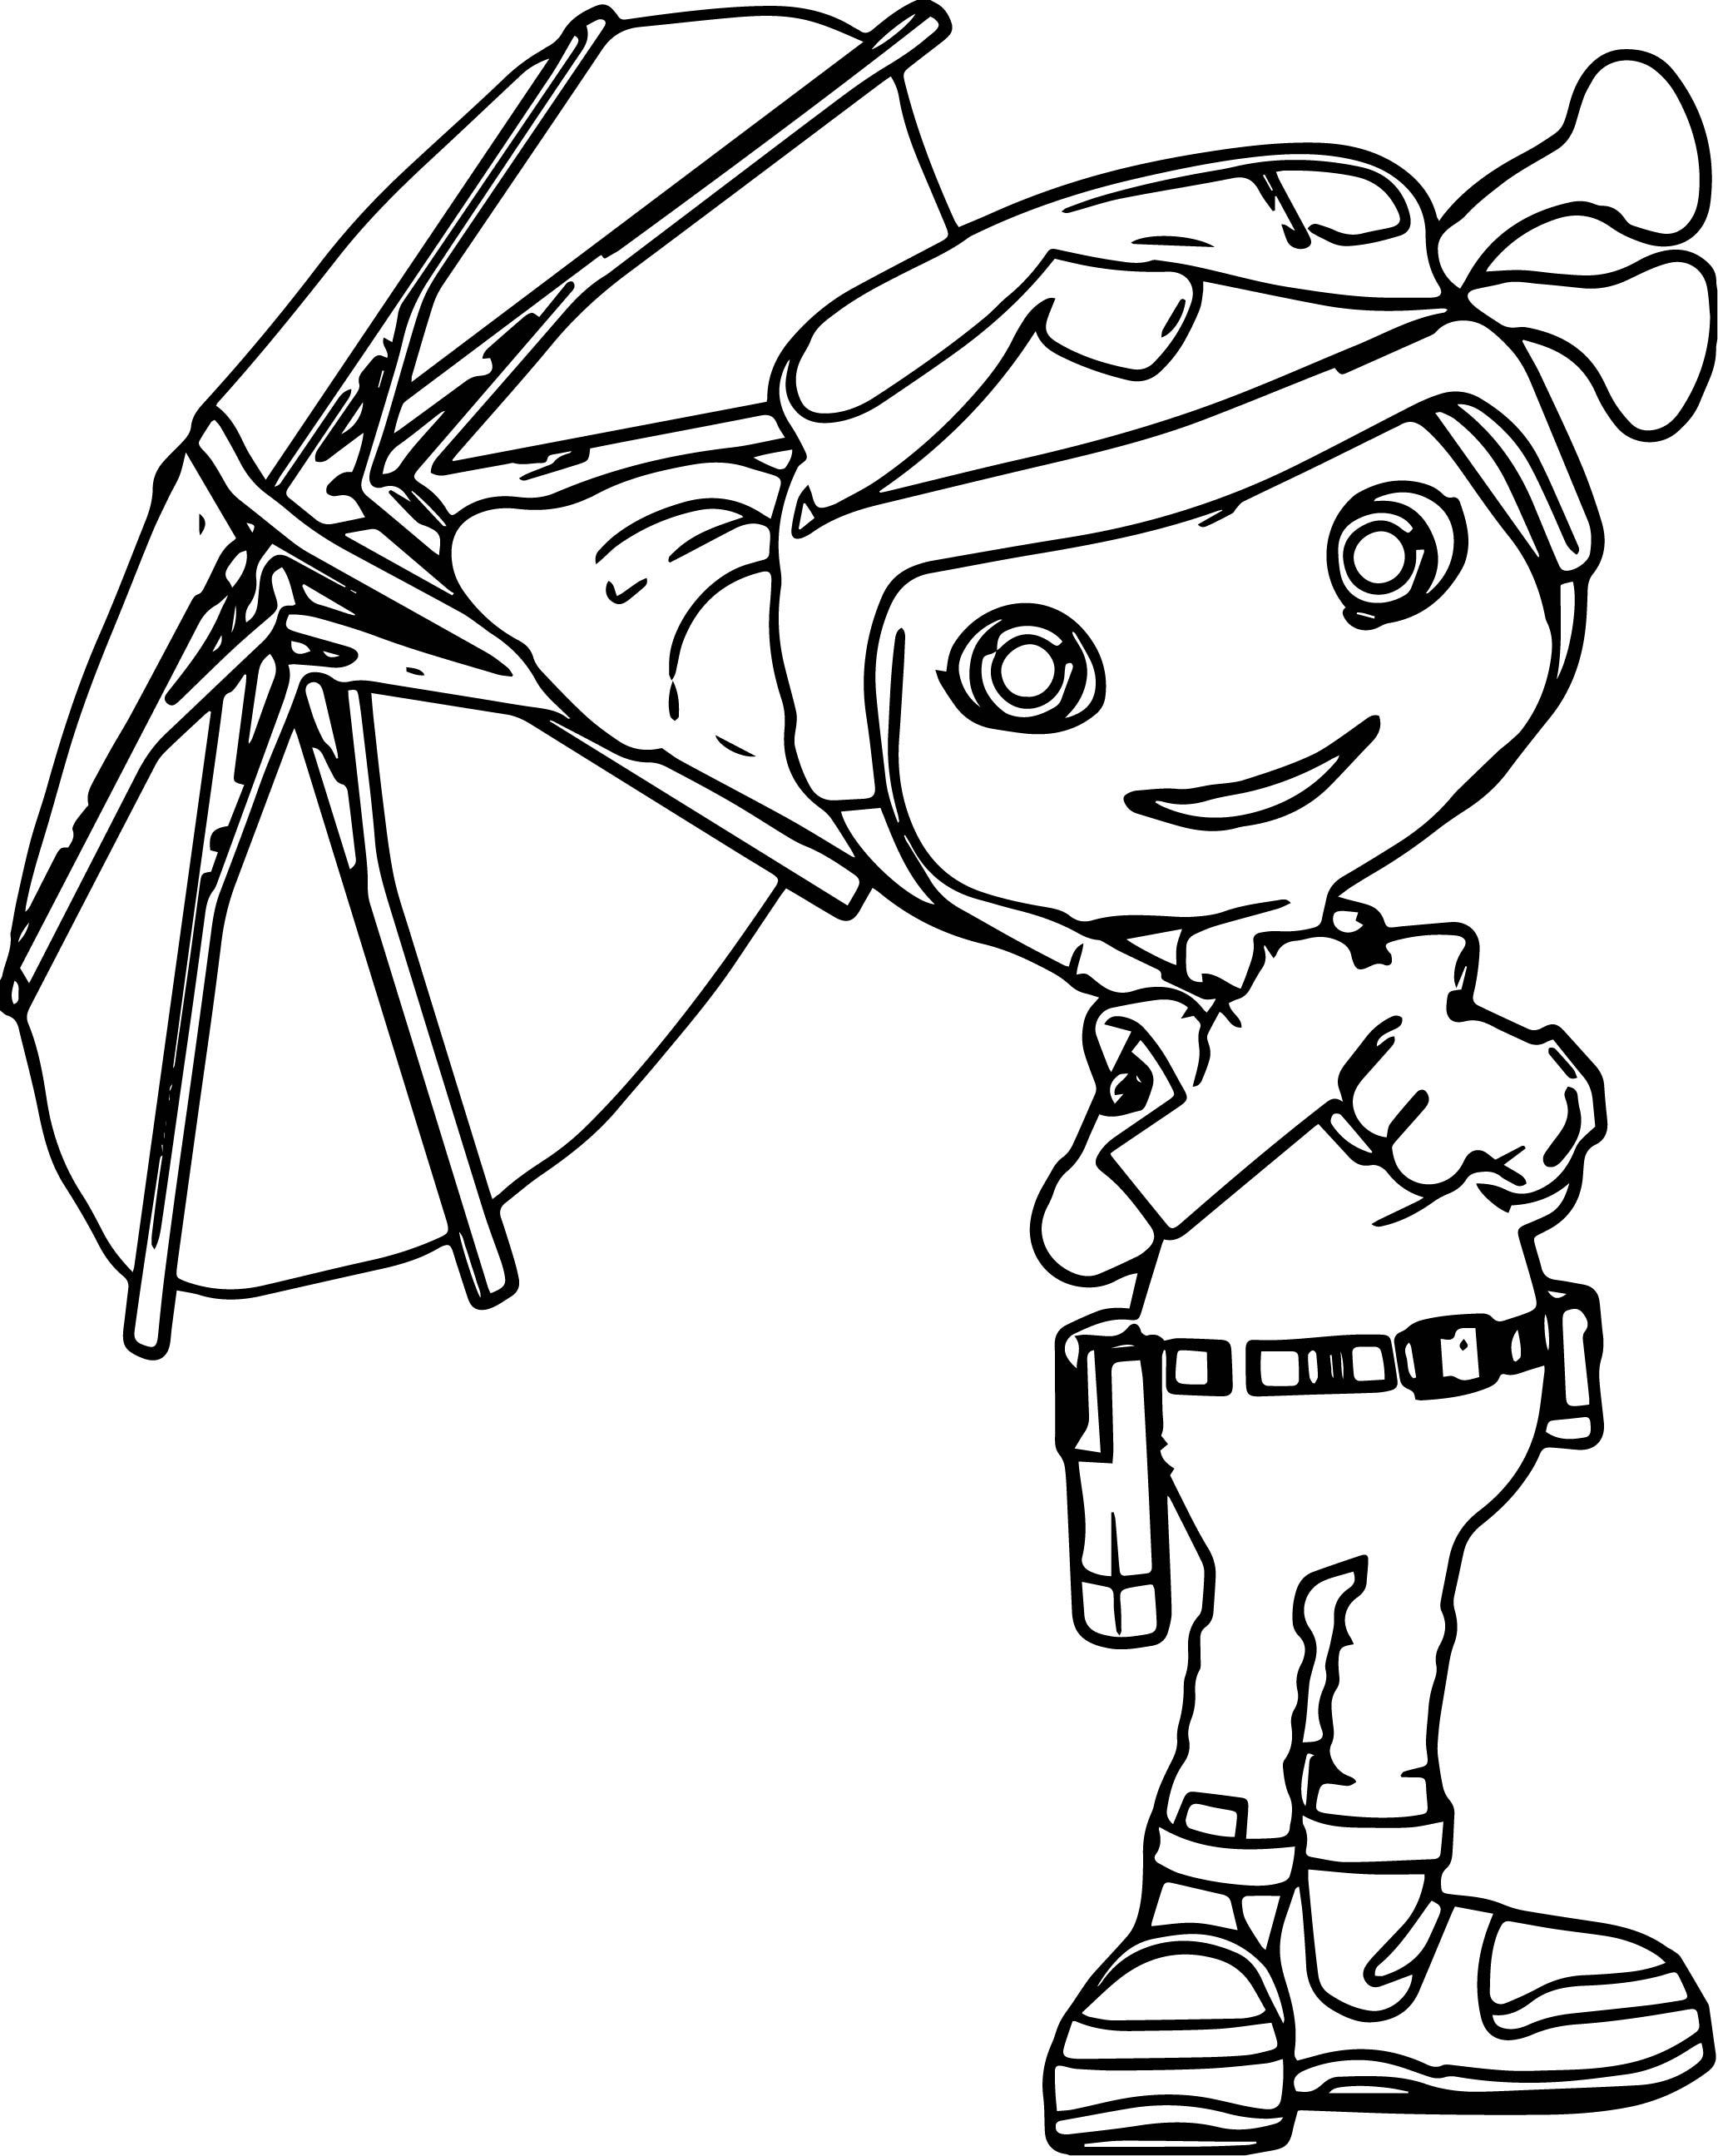 Boomer Umbrella Coloring Page